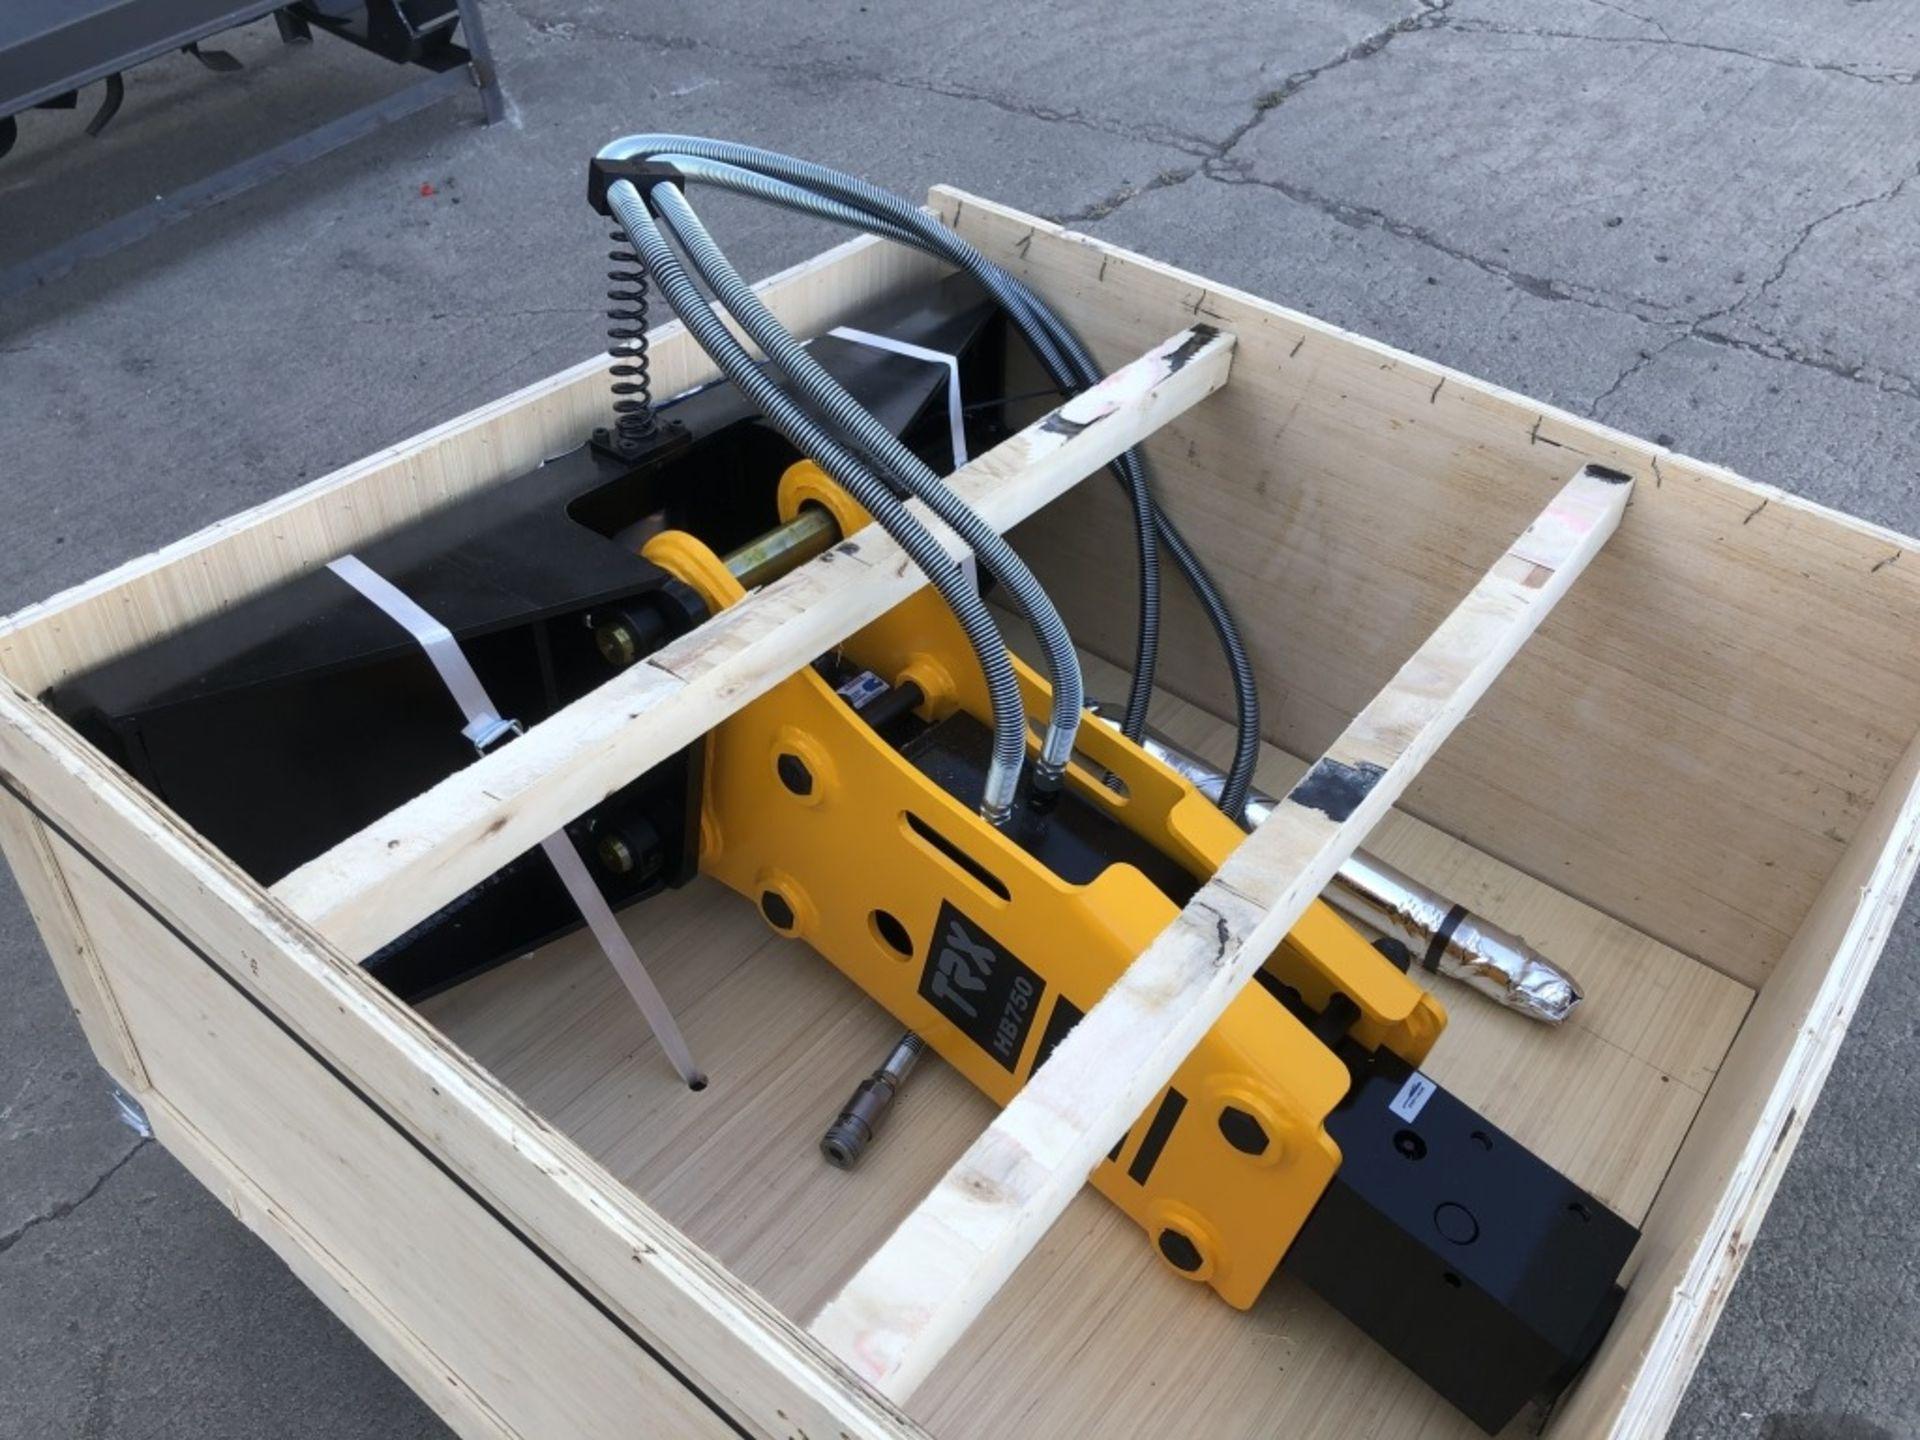 2020 TRX HB750 Hydraulic Hammer - Image 2 of 3